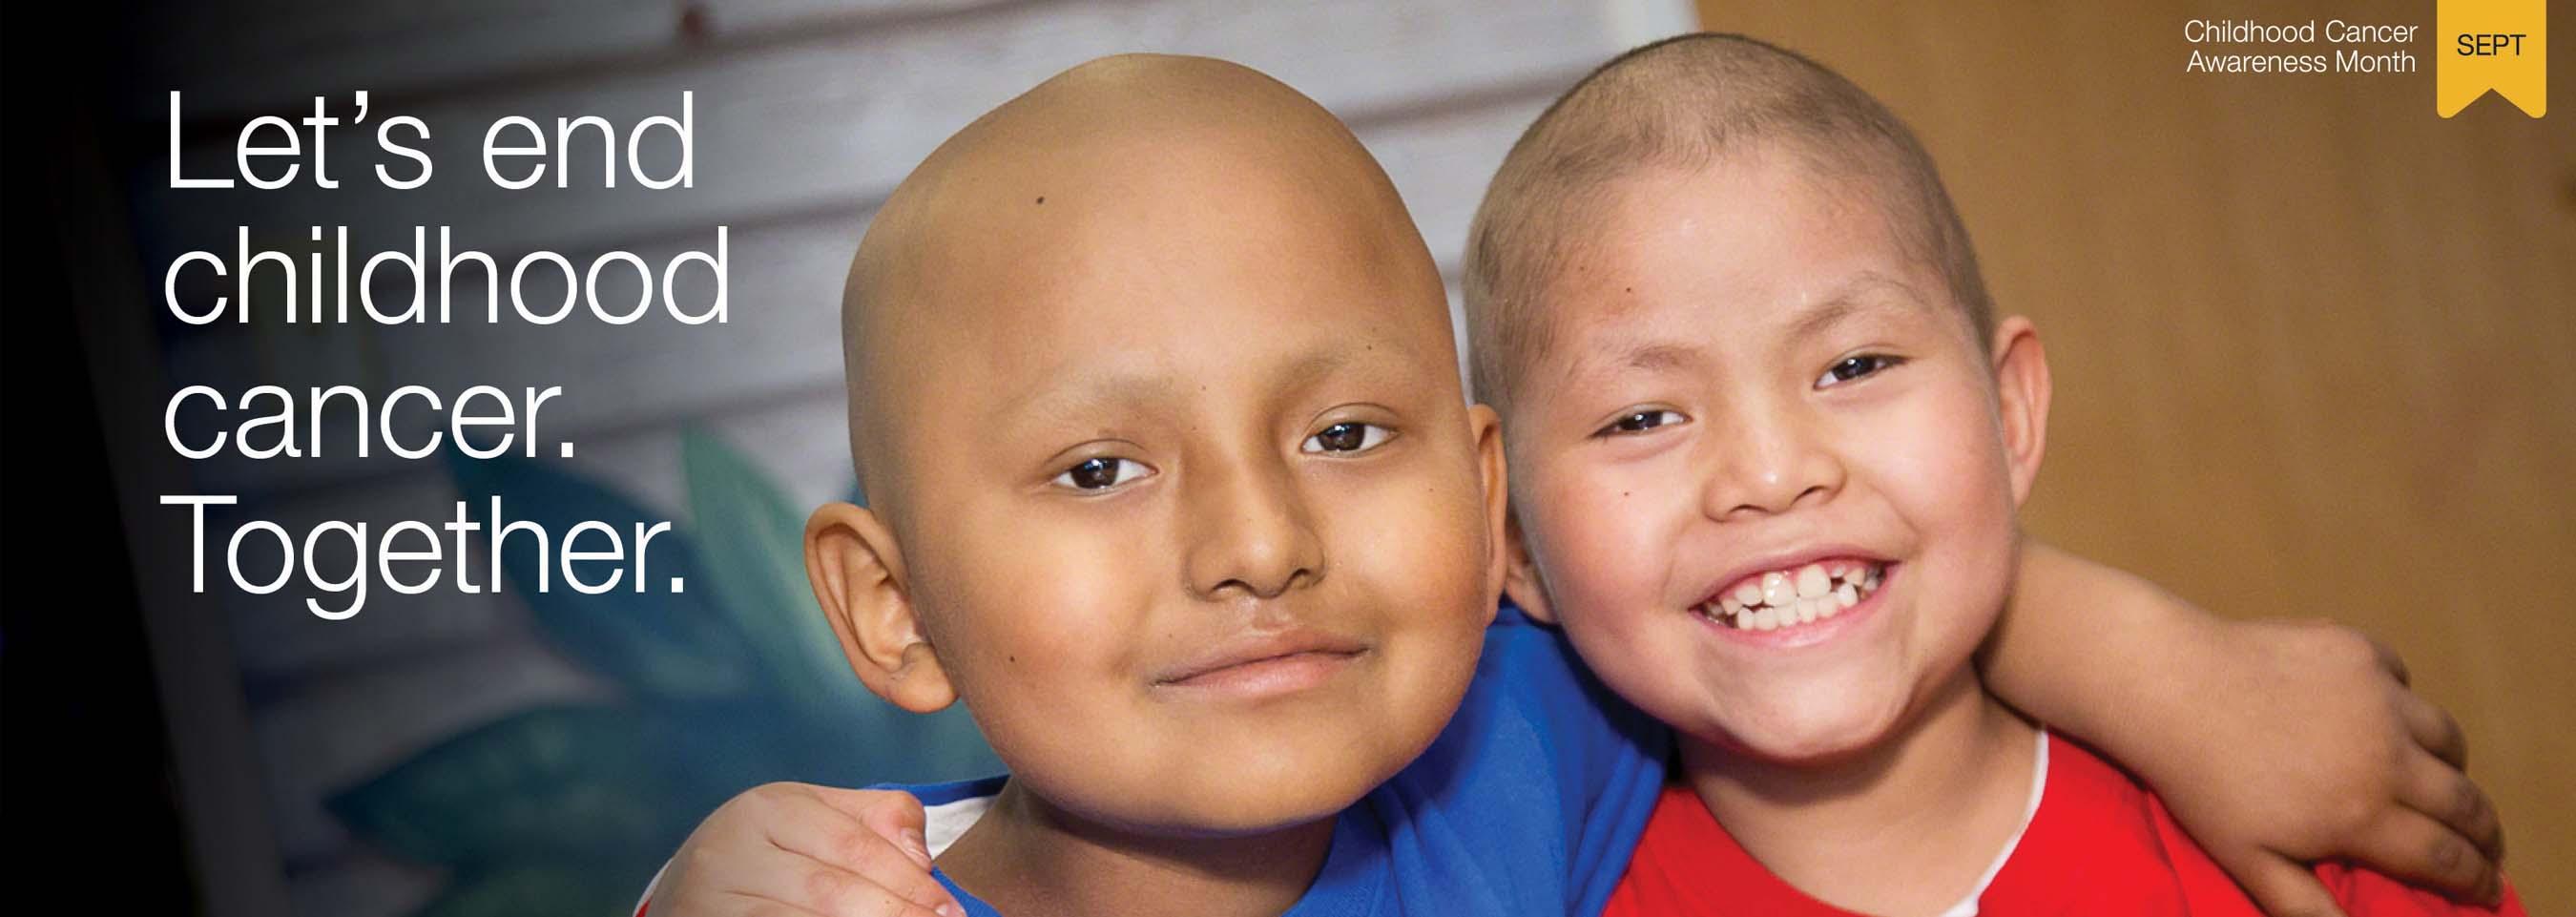 childre valley childrens cancer - HD2700×961